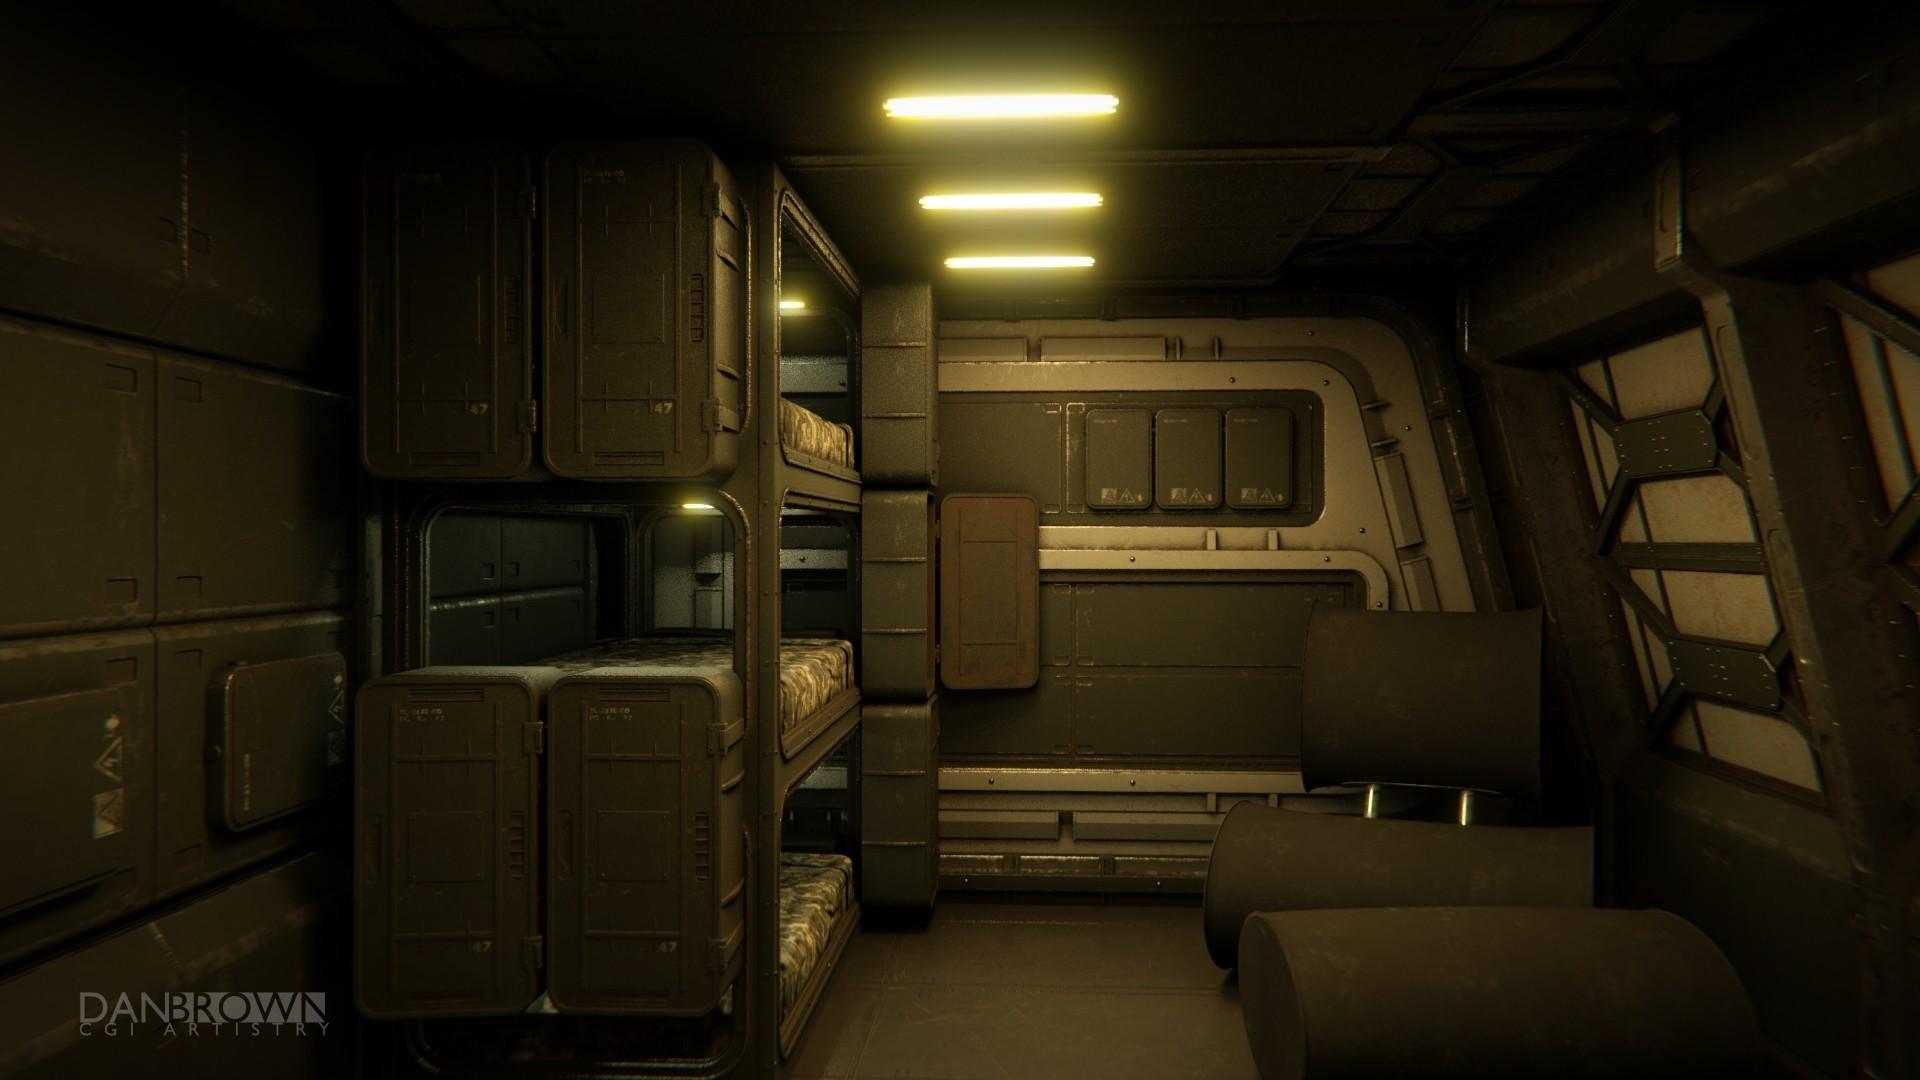 Dan Brown CGI  Scifi Art  Space Freighter Neros Fire Interior WIP